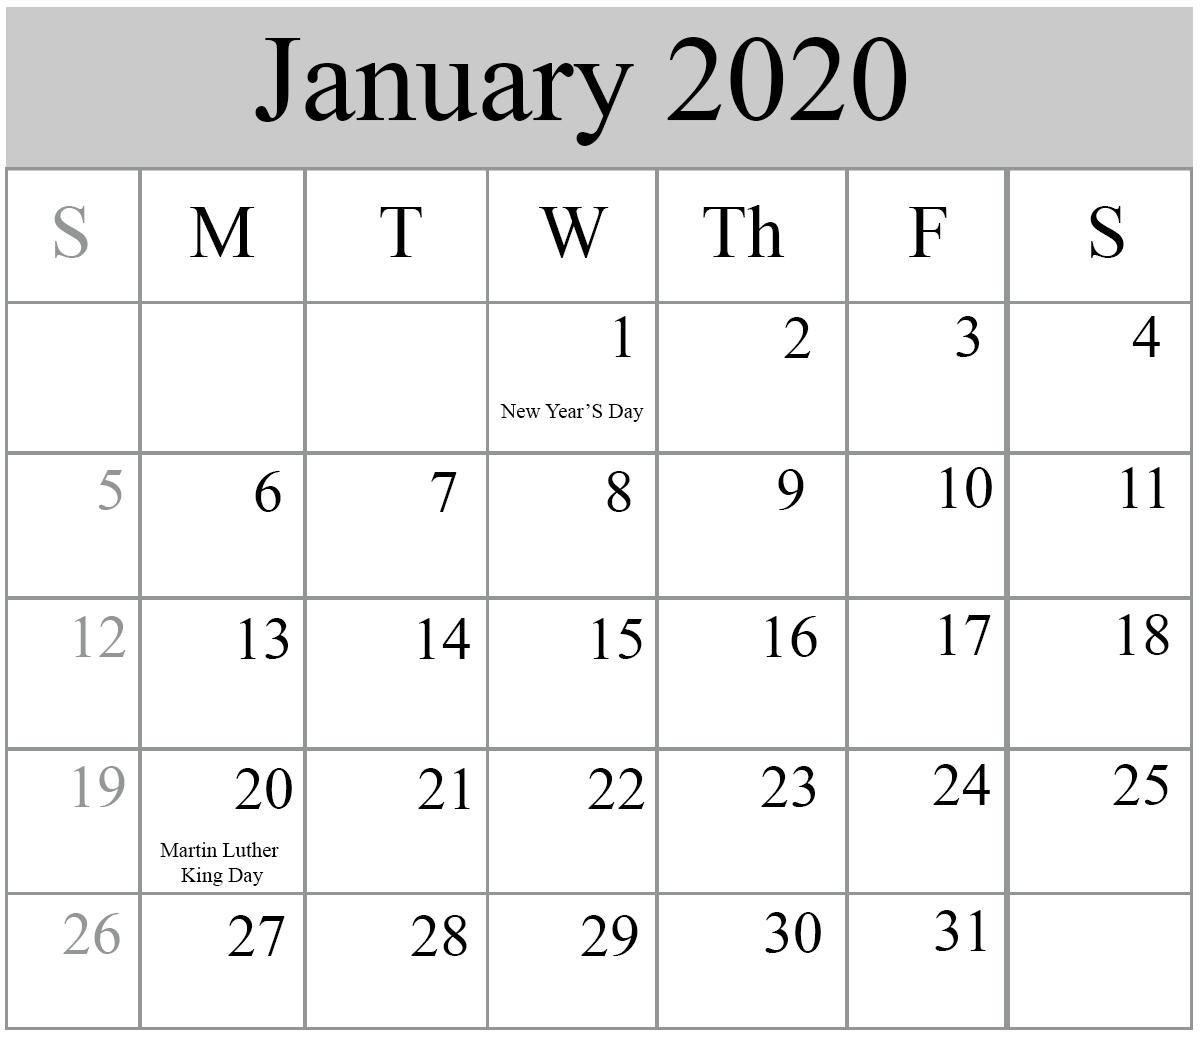 Holidays Calendar January 2020